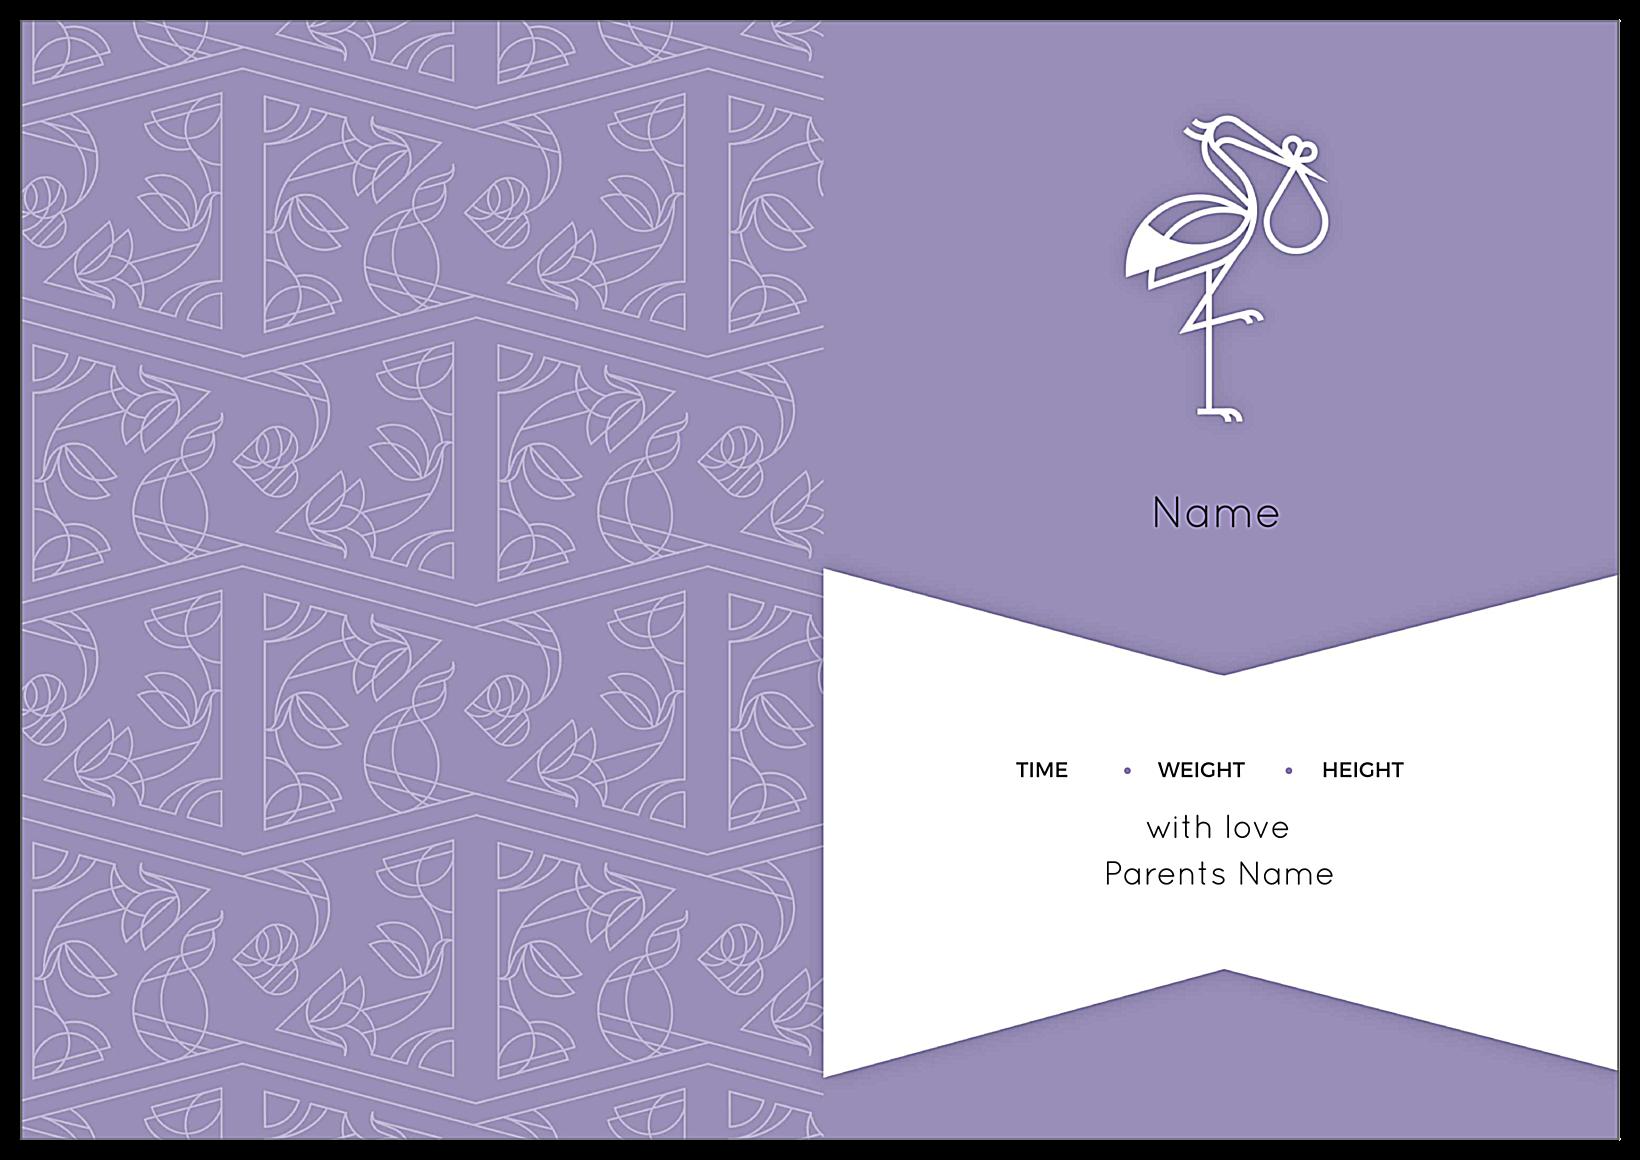 Say Hello Stork back - Greeting Cards Maker